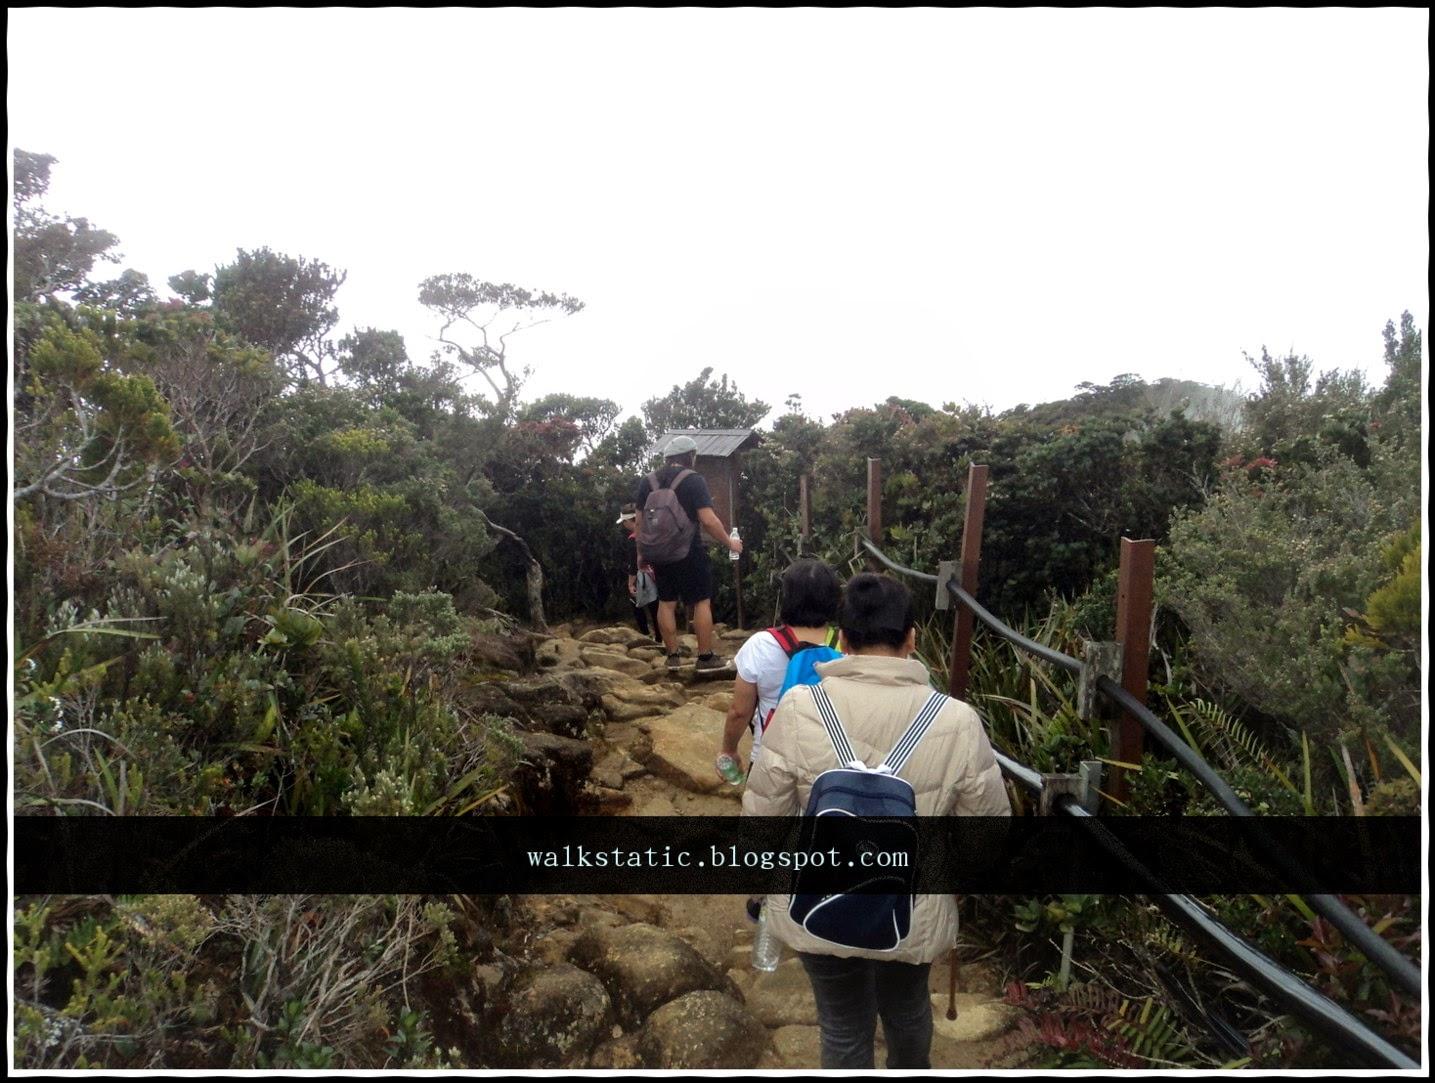 Ekpedisi Gunung Kinabalu 2015